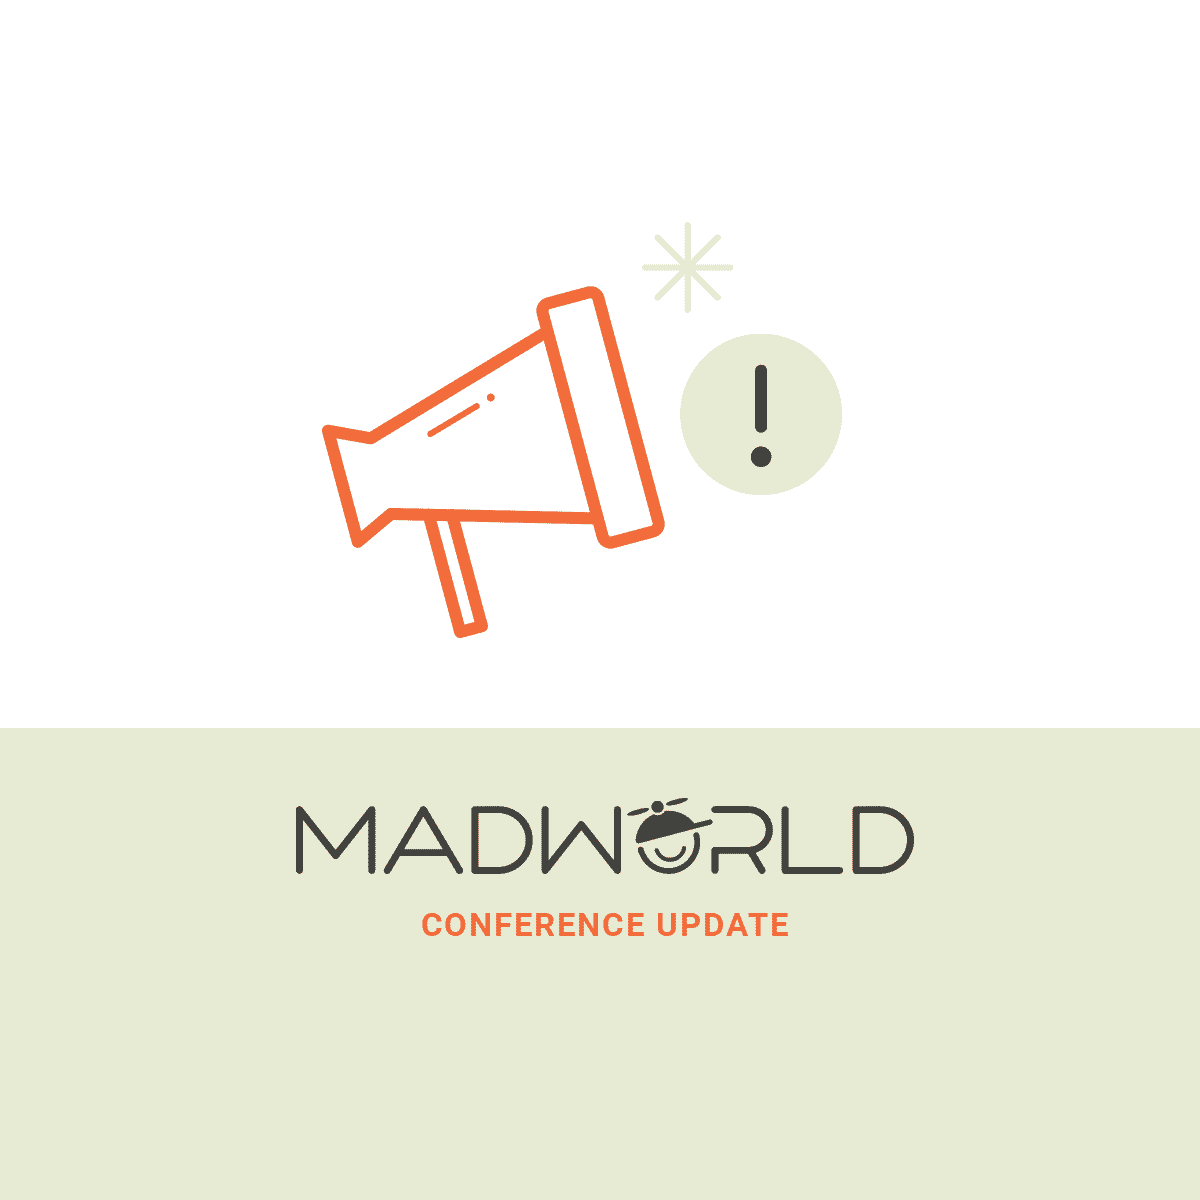 conference update madworld